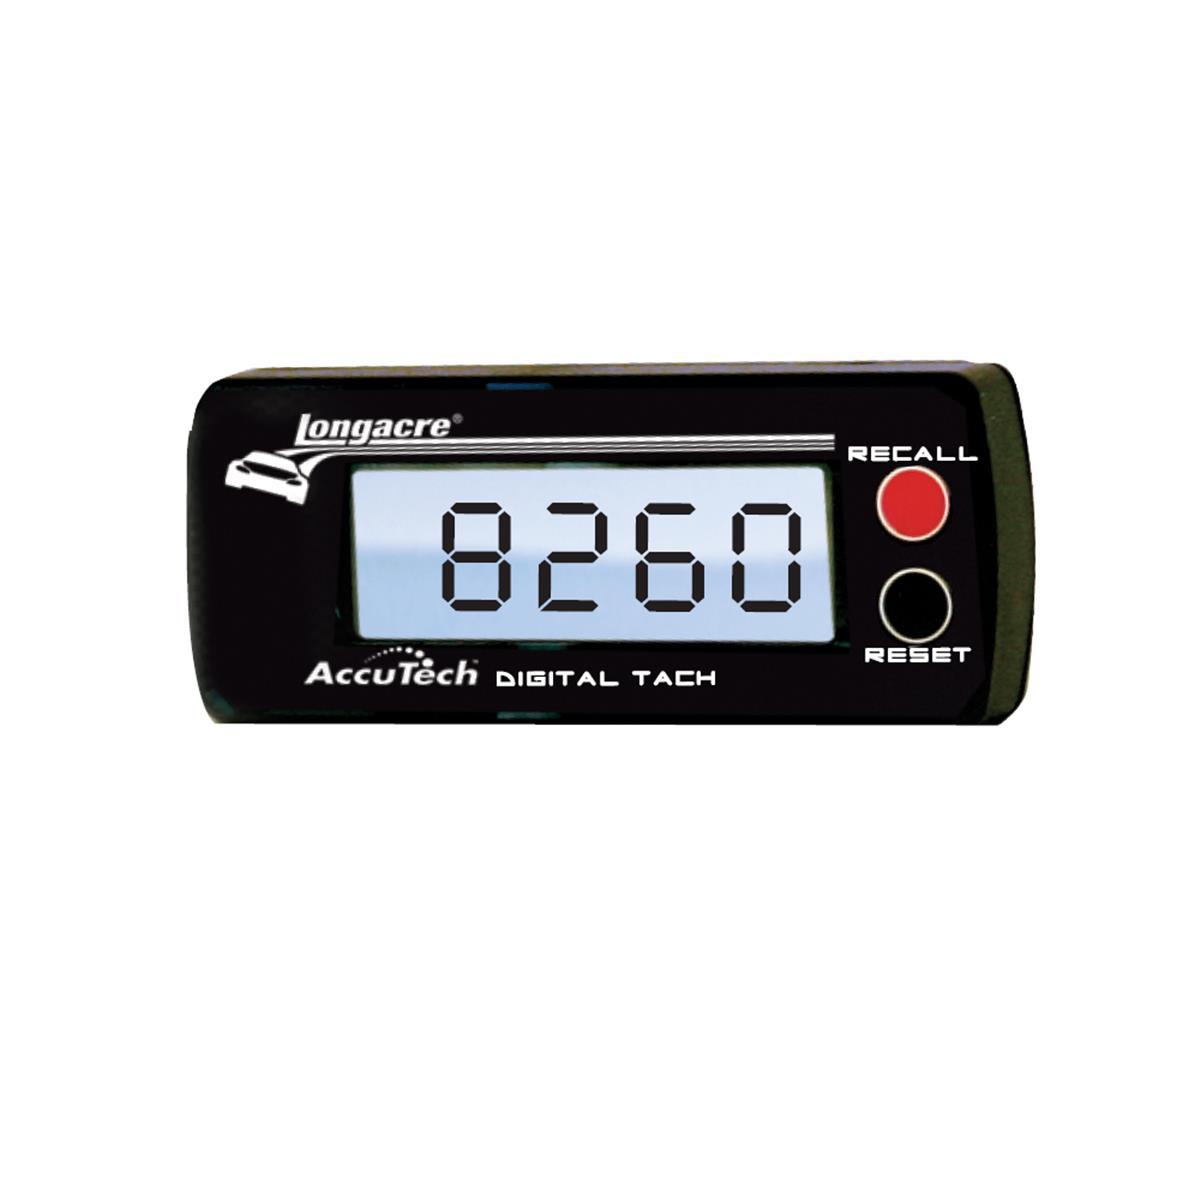 hight resolution of longacre accutech digital tachometer 44402 longacre digital tach wiring